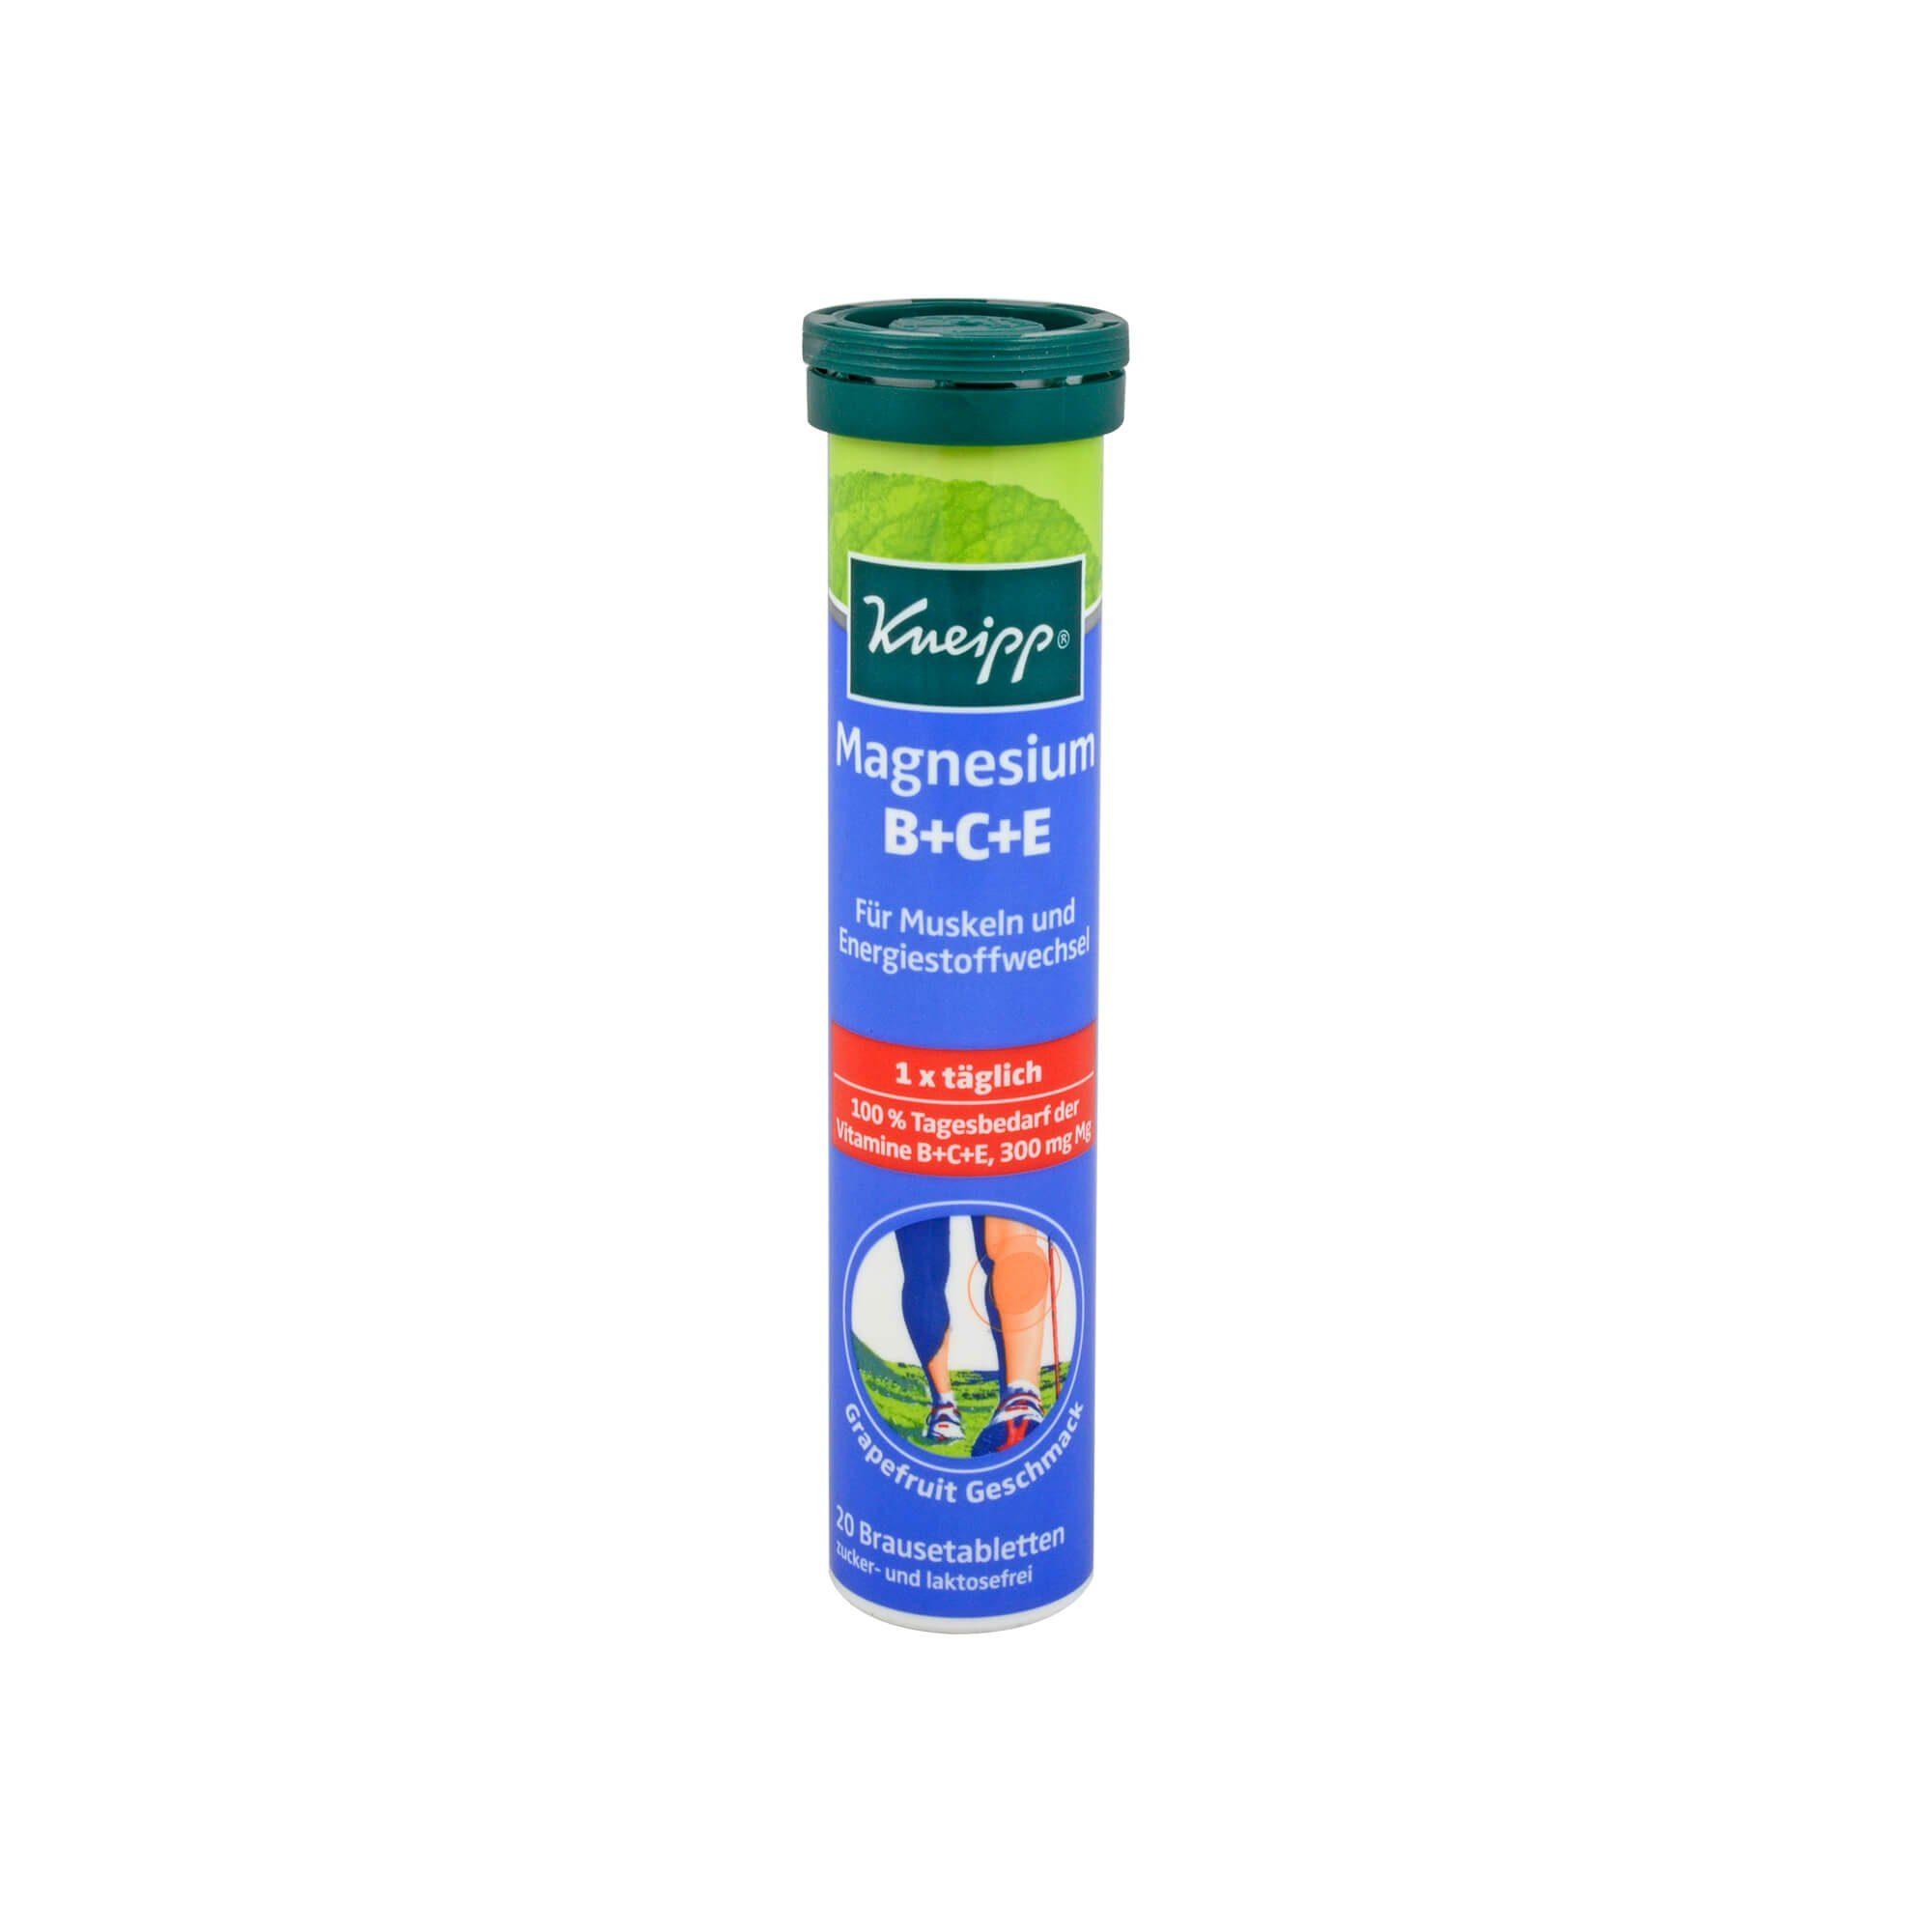 Kneipp Magnesium + Vitamine B+C+E , 20 St